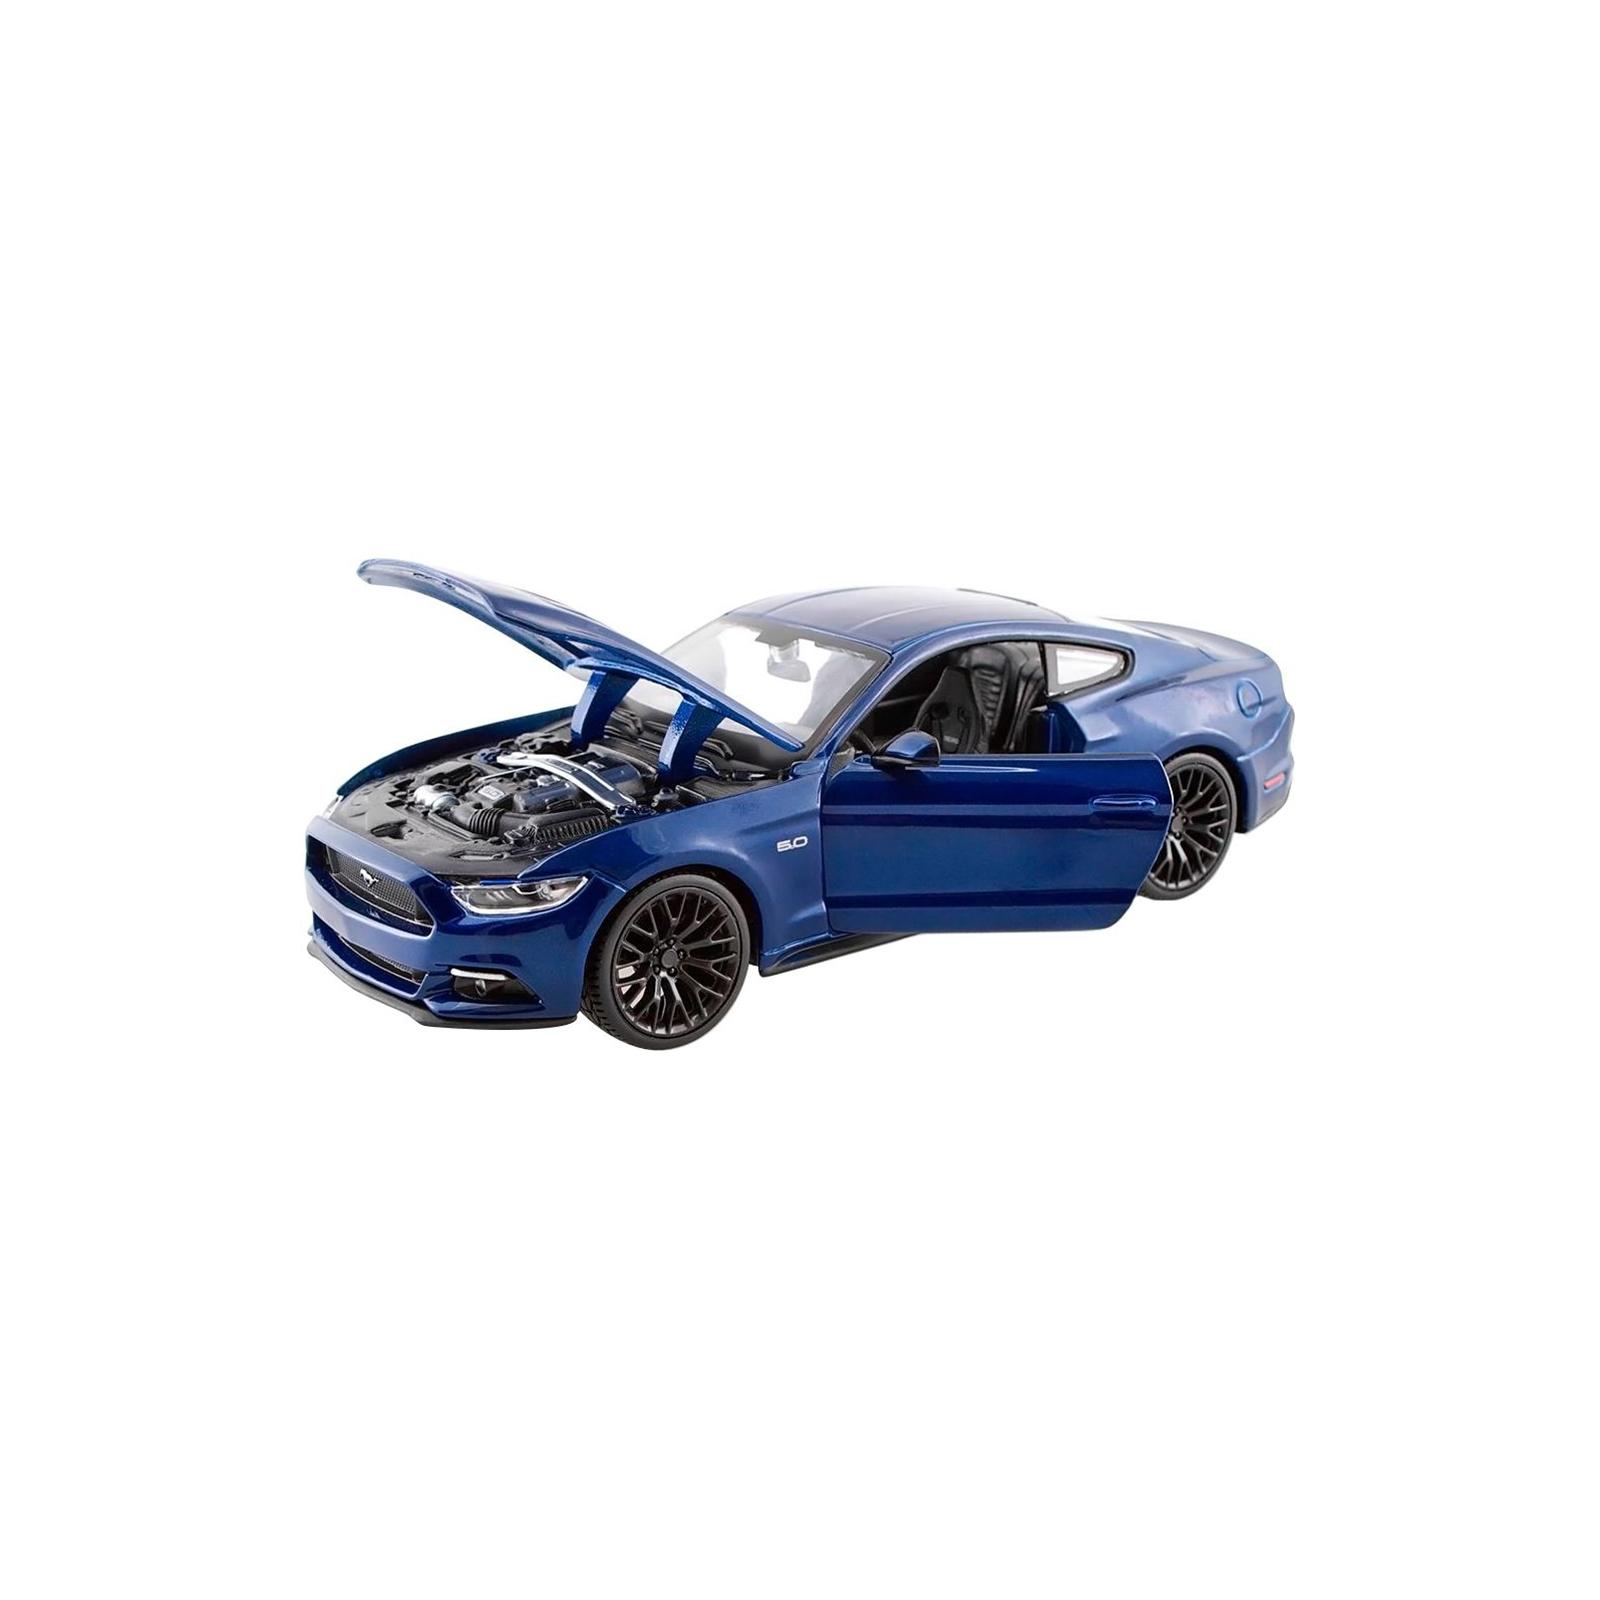 Машина Maisto Ford Mustang GT 2015 (1:24) синий (31508 blue) изображение 2